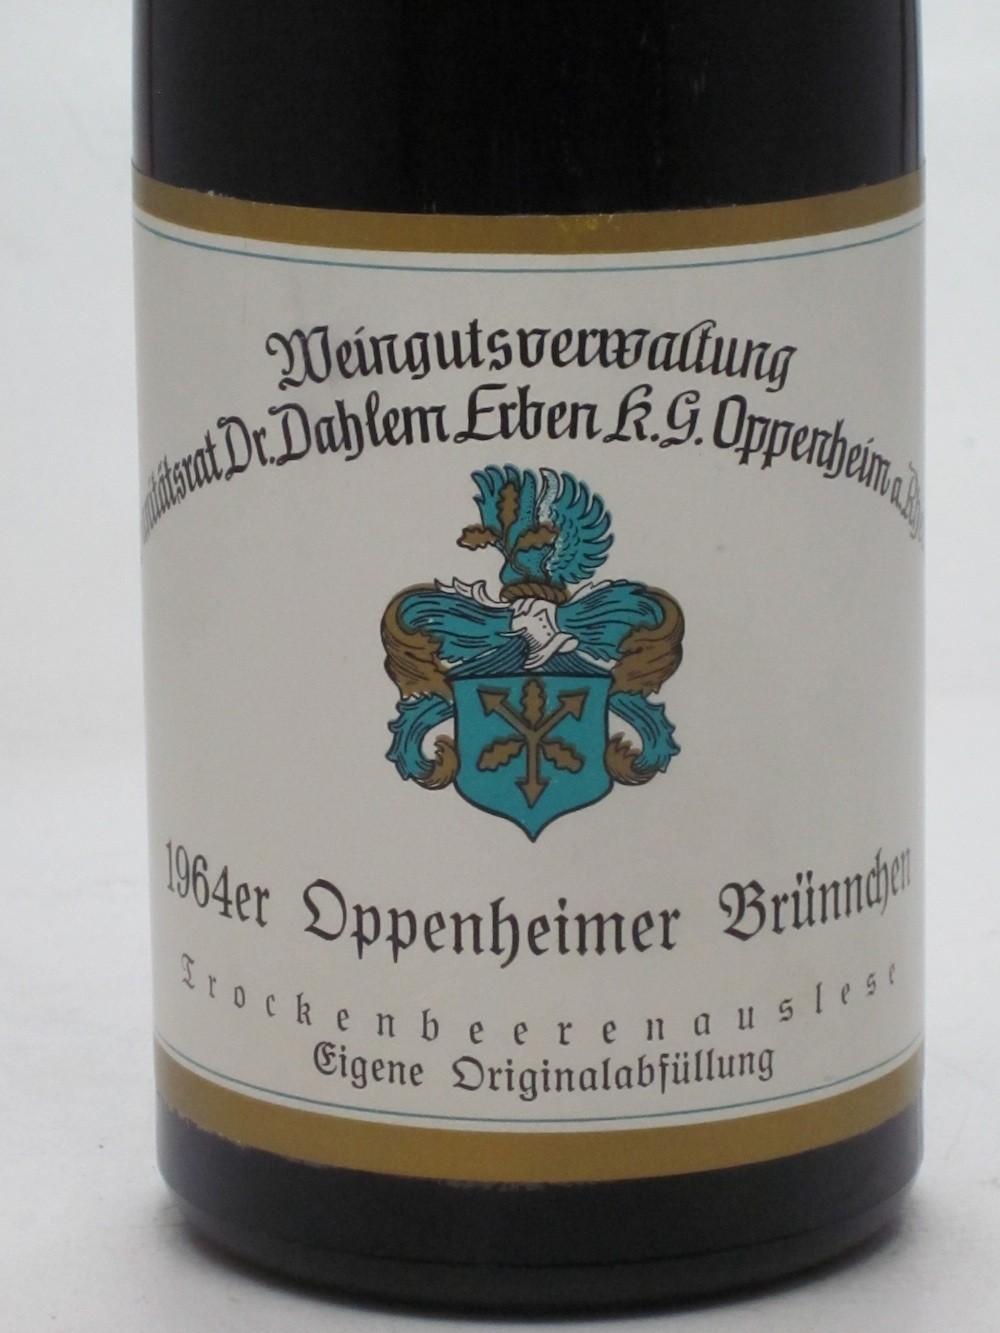 Oppenheimer Brünnchen Trockenbeerenauslese Dr. Dahlem 1964